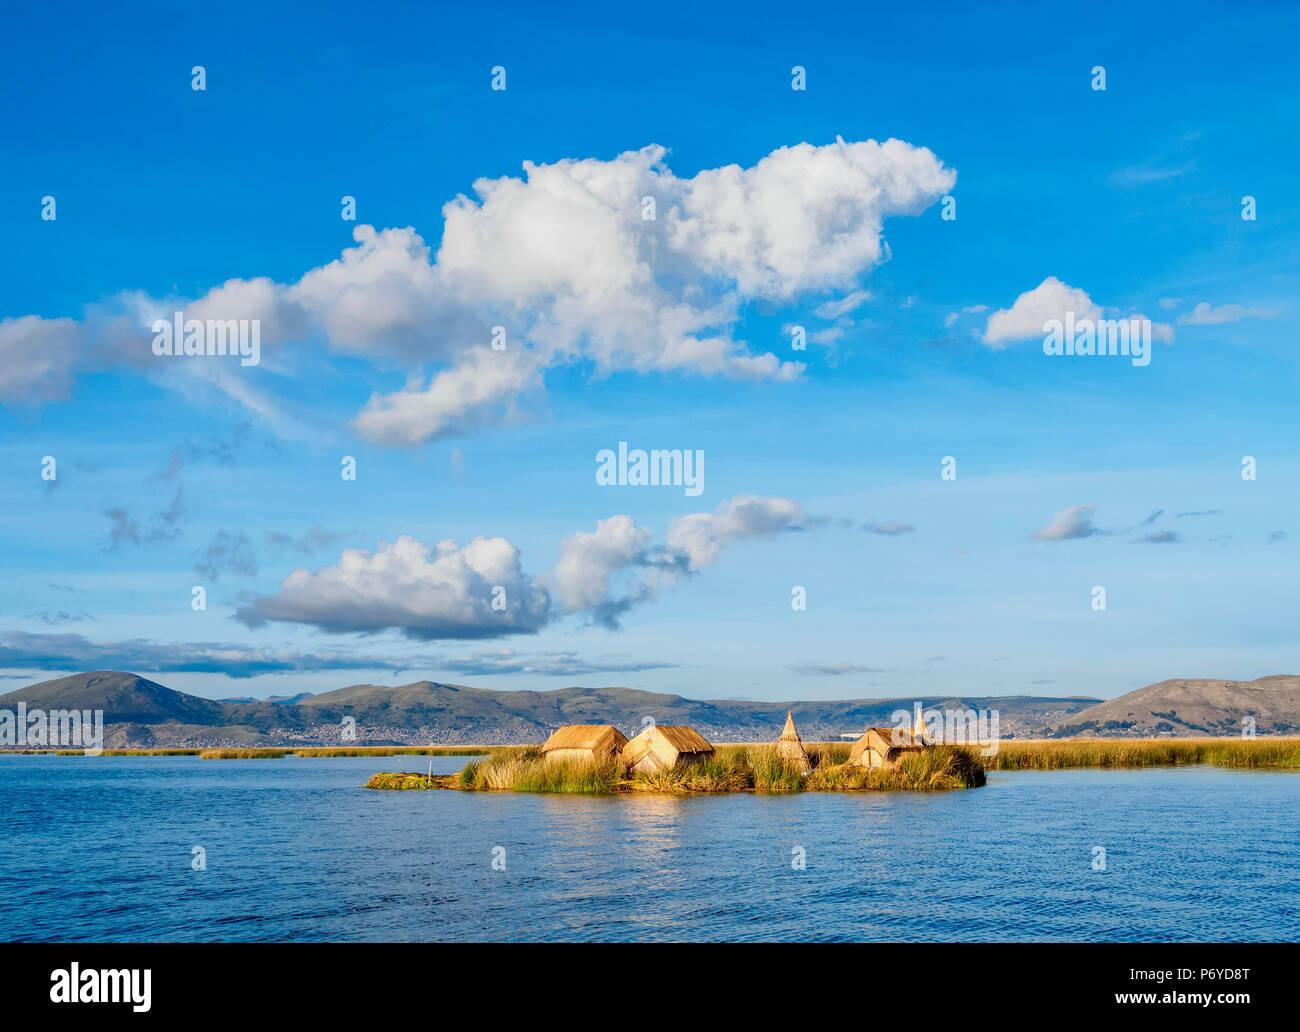 Uros Floating Island, Lake Titicaca, Puno Region, Peru - Stock Image